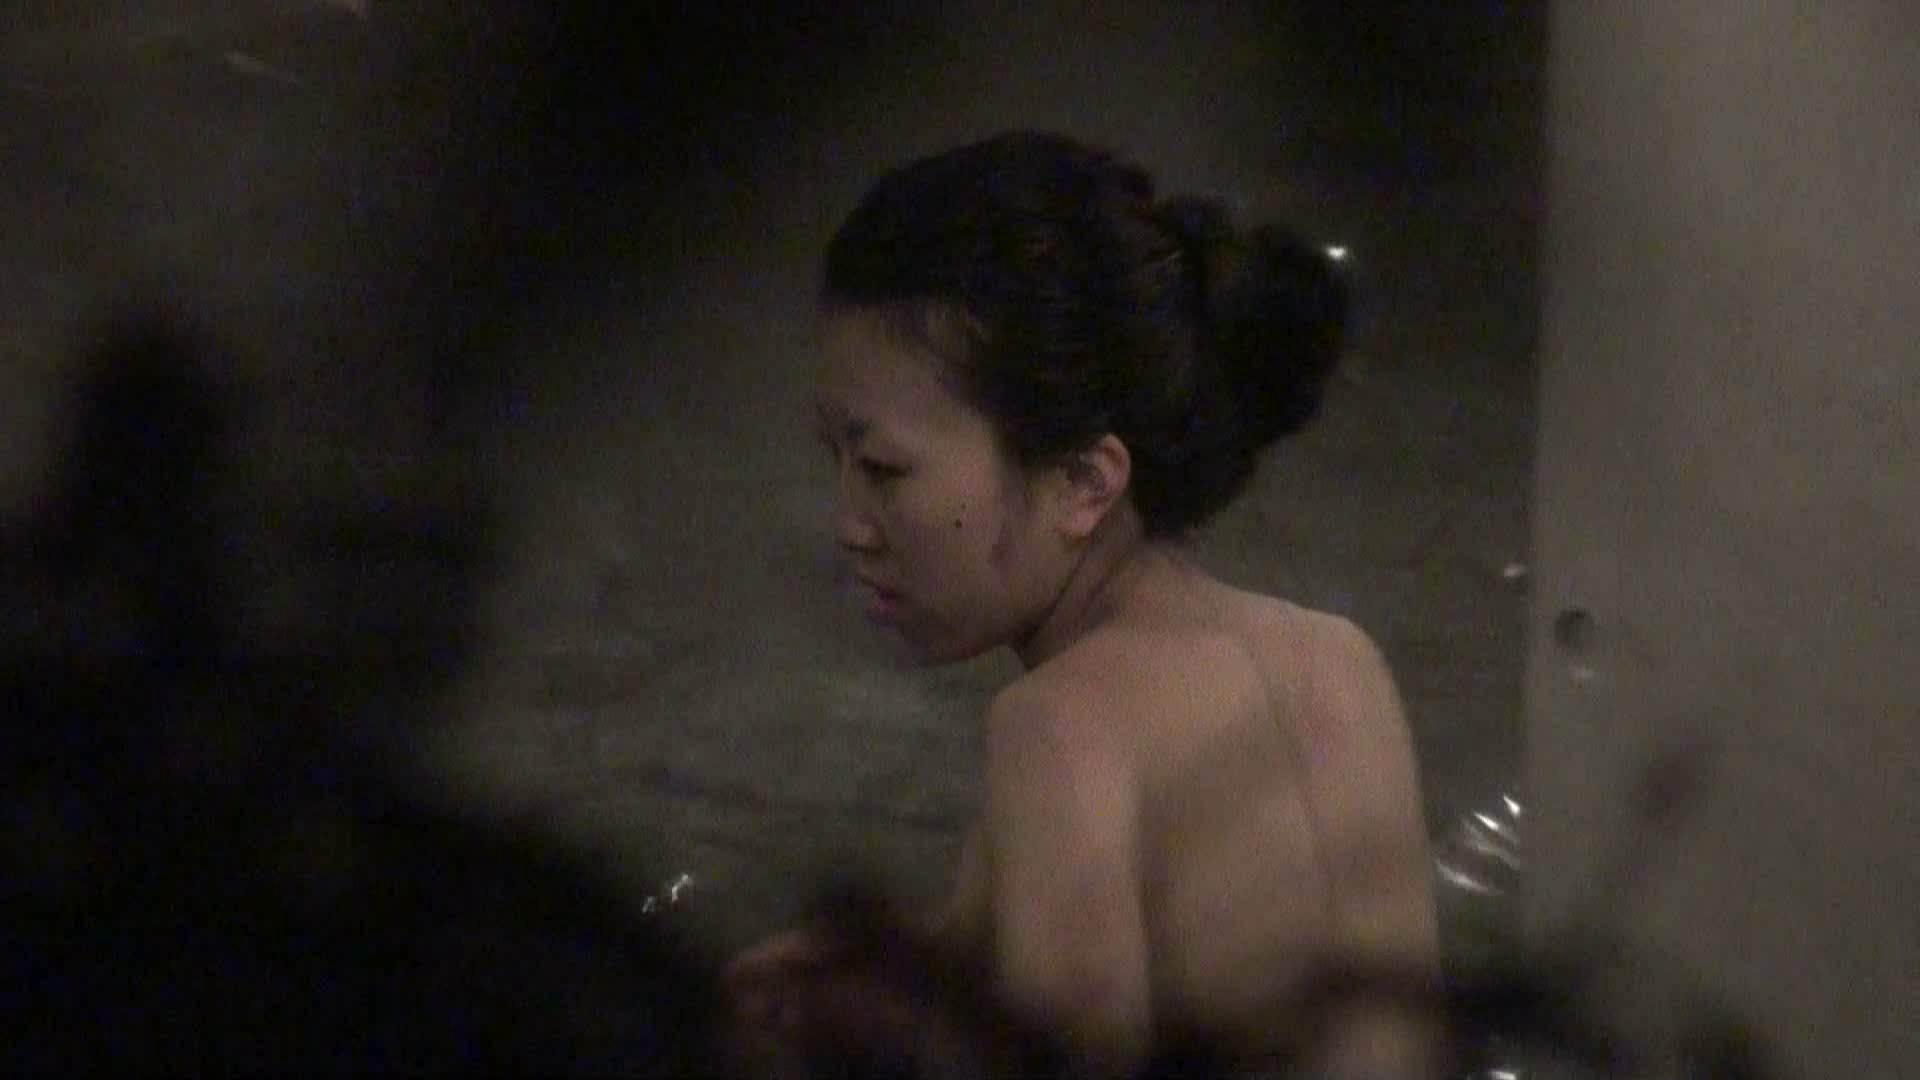 Aquaな露天風呂Vol.375 露天 盗撮セックス無修正動画無料 106連発 29